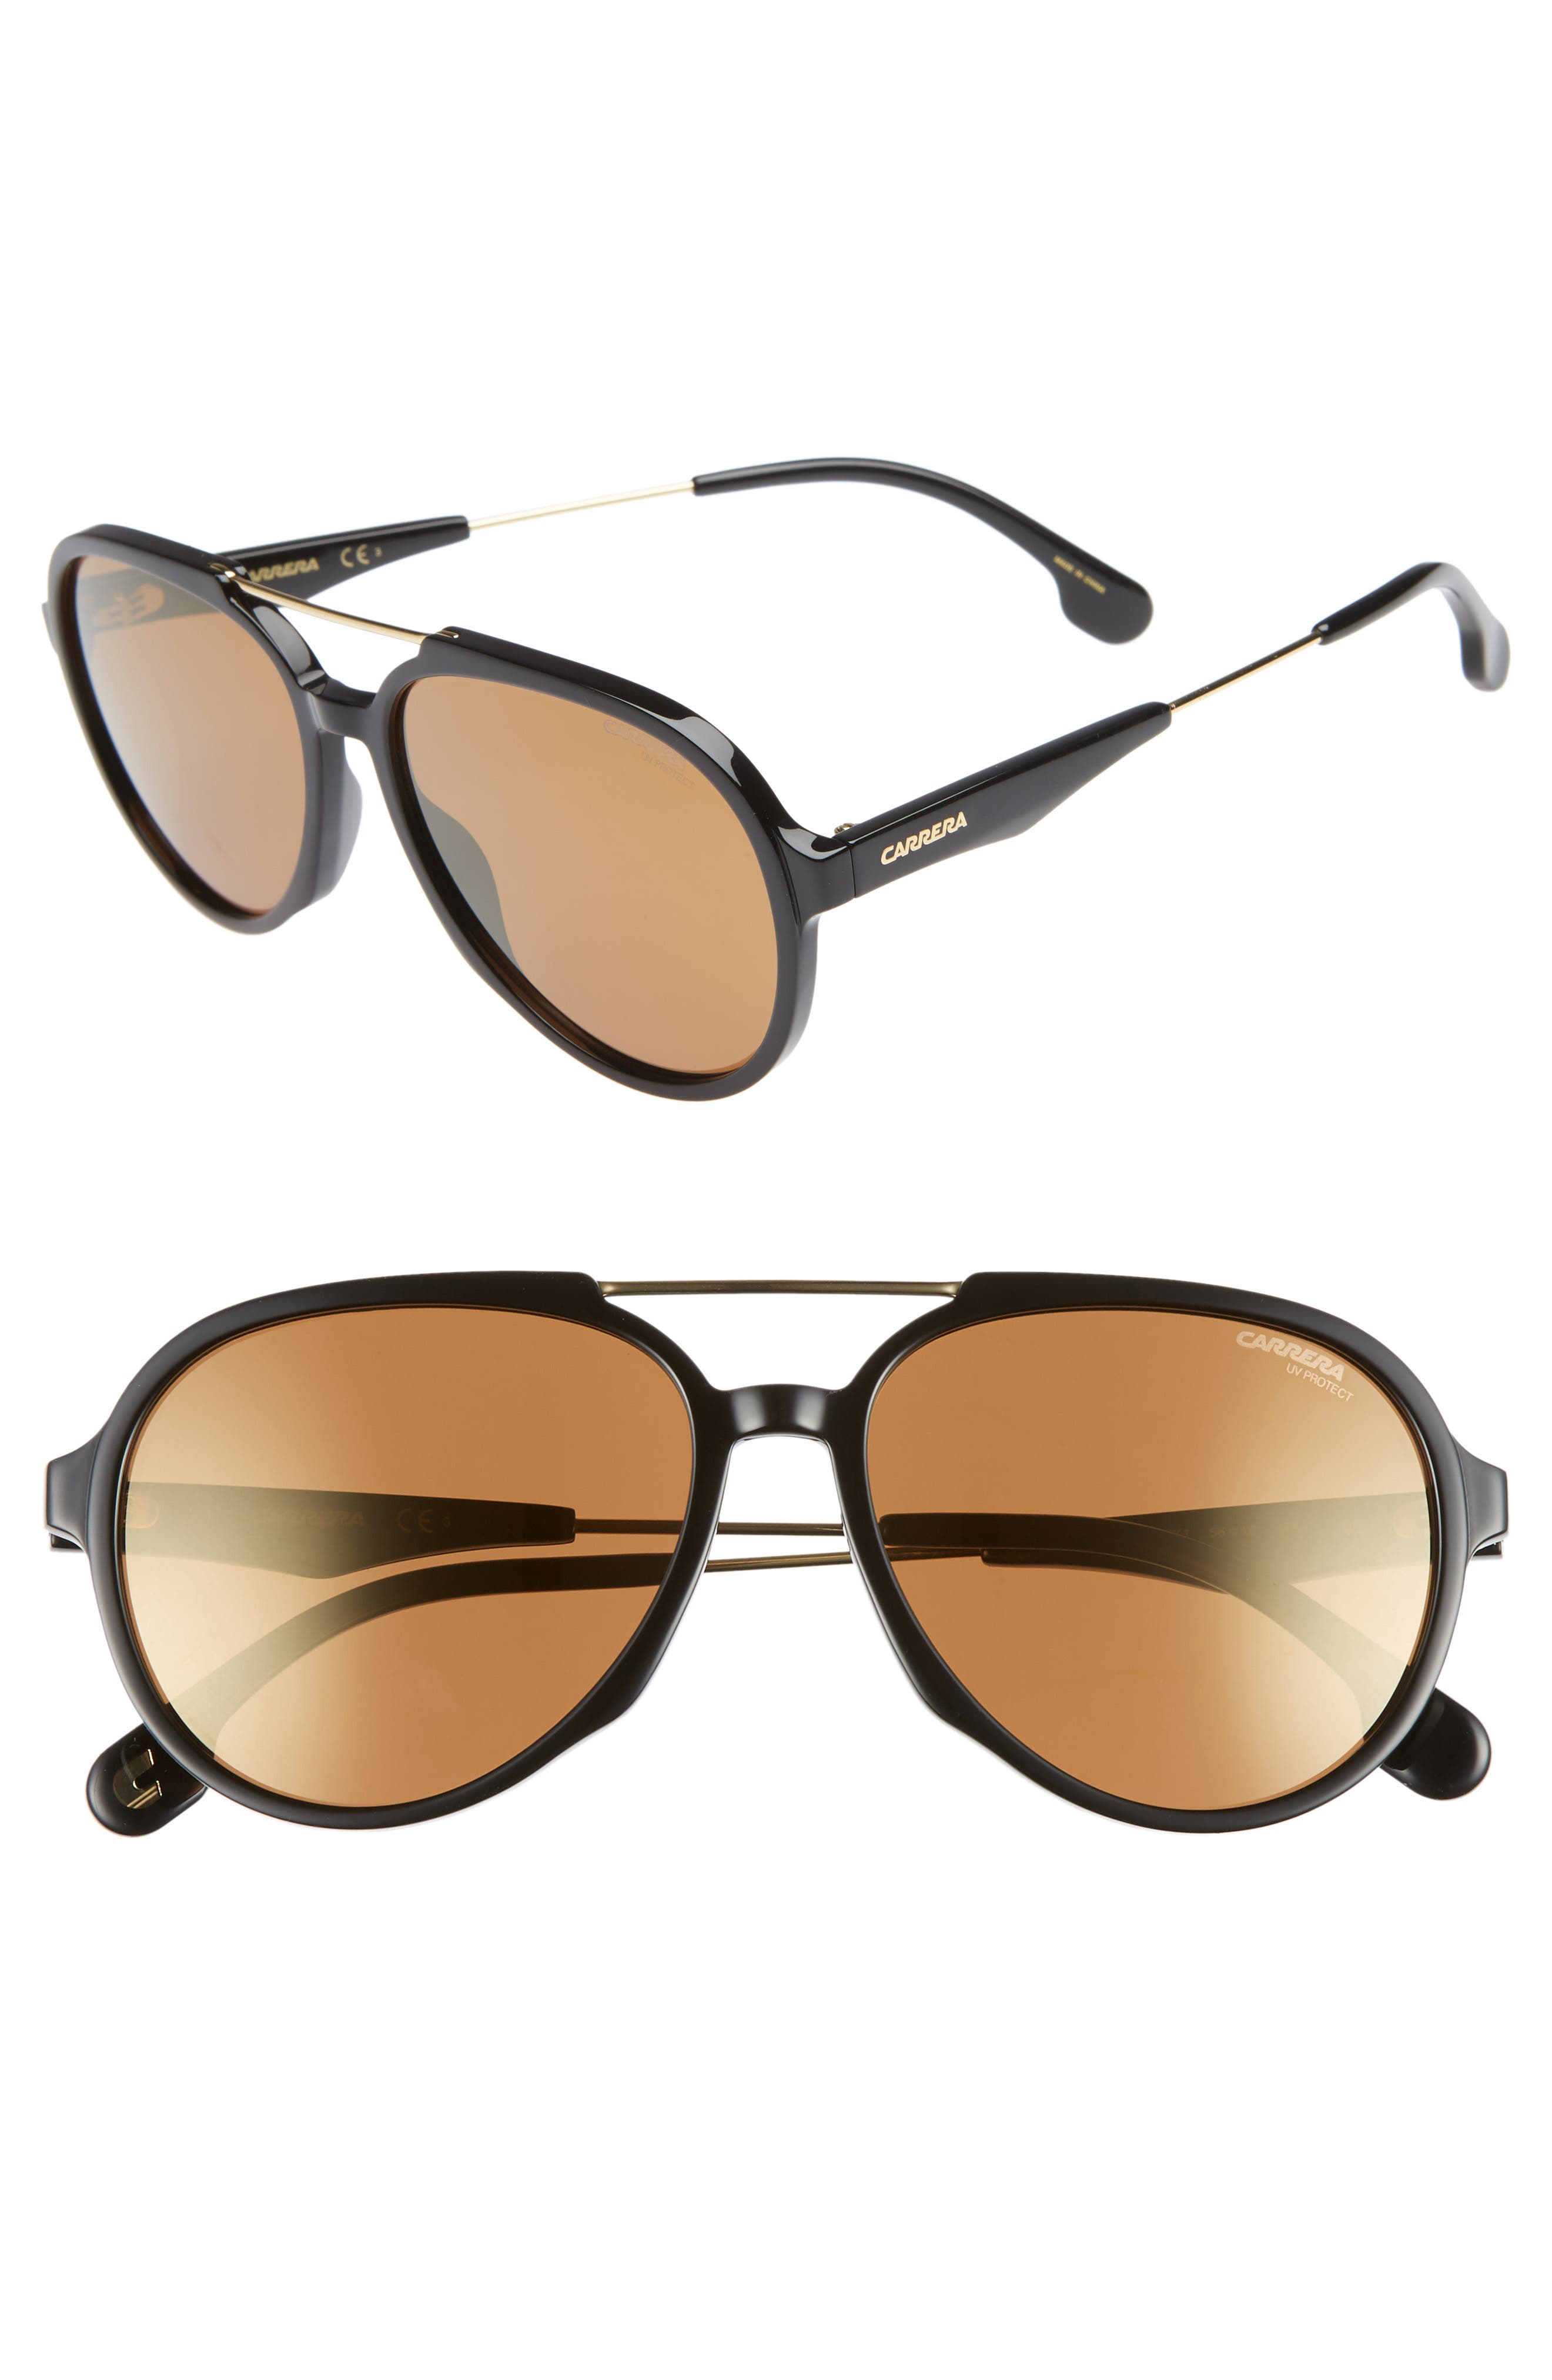 Carrera Eyewear 5m Aviator Sunglasses - Black